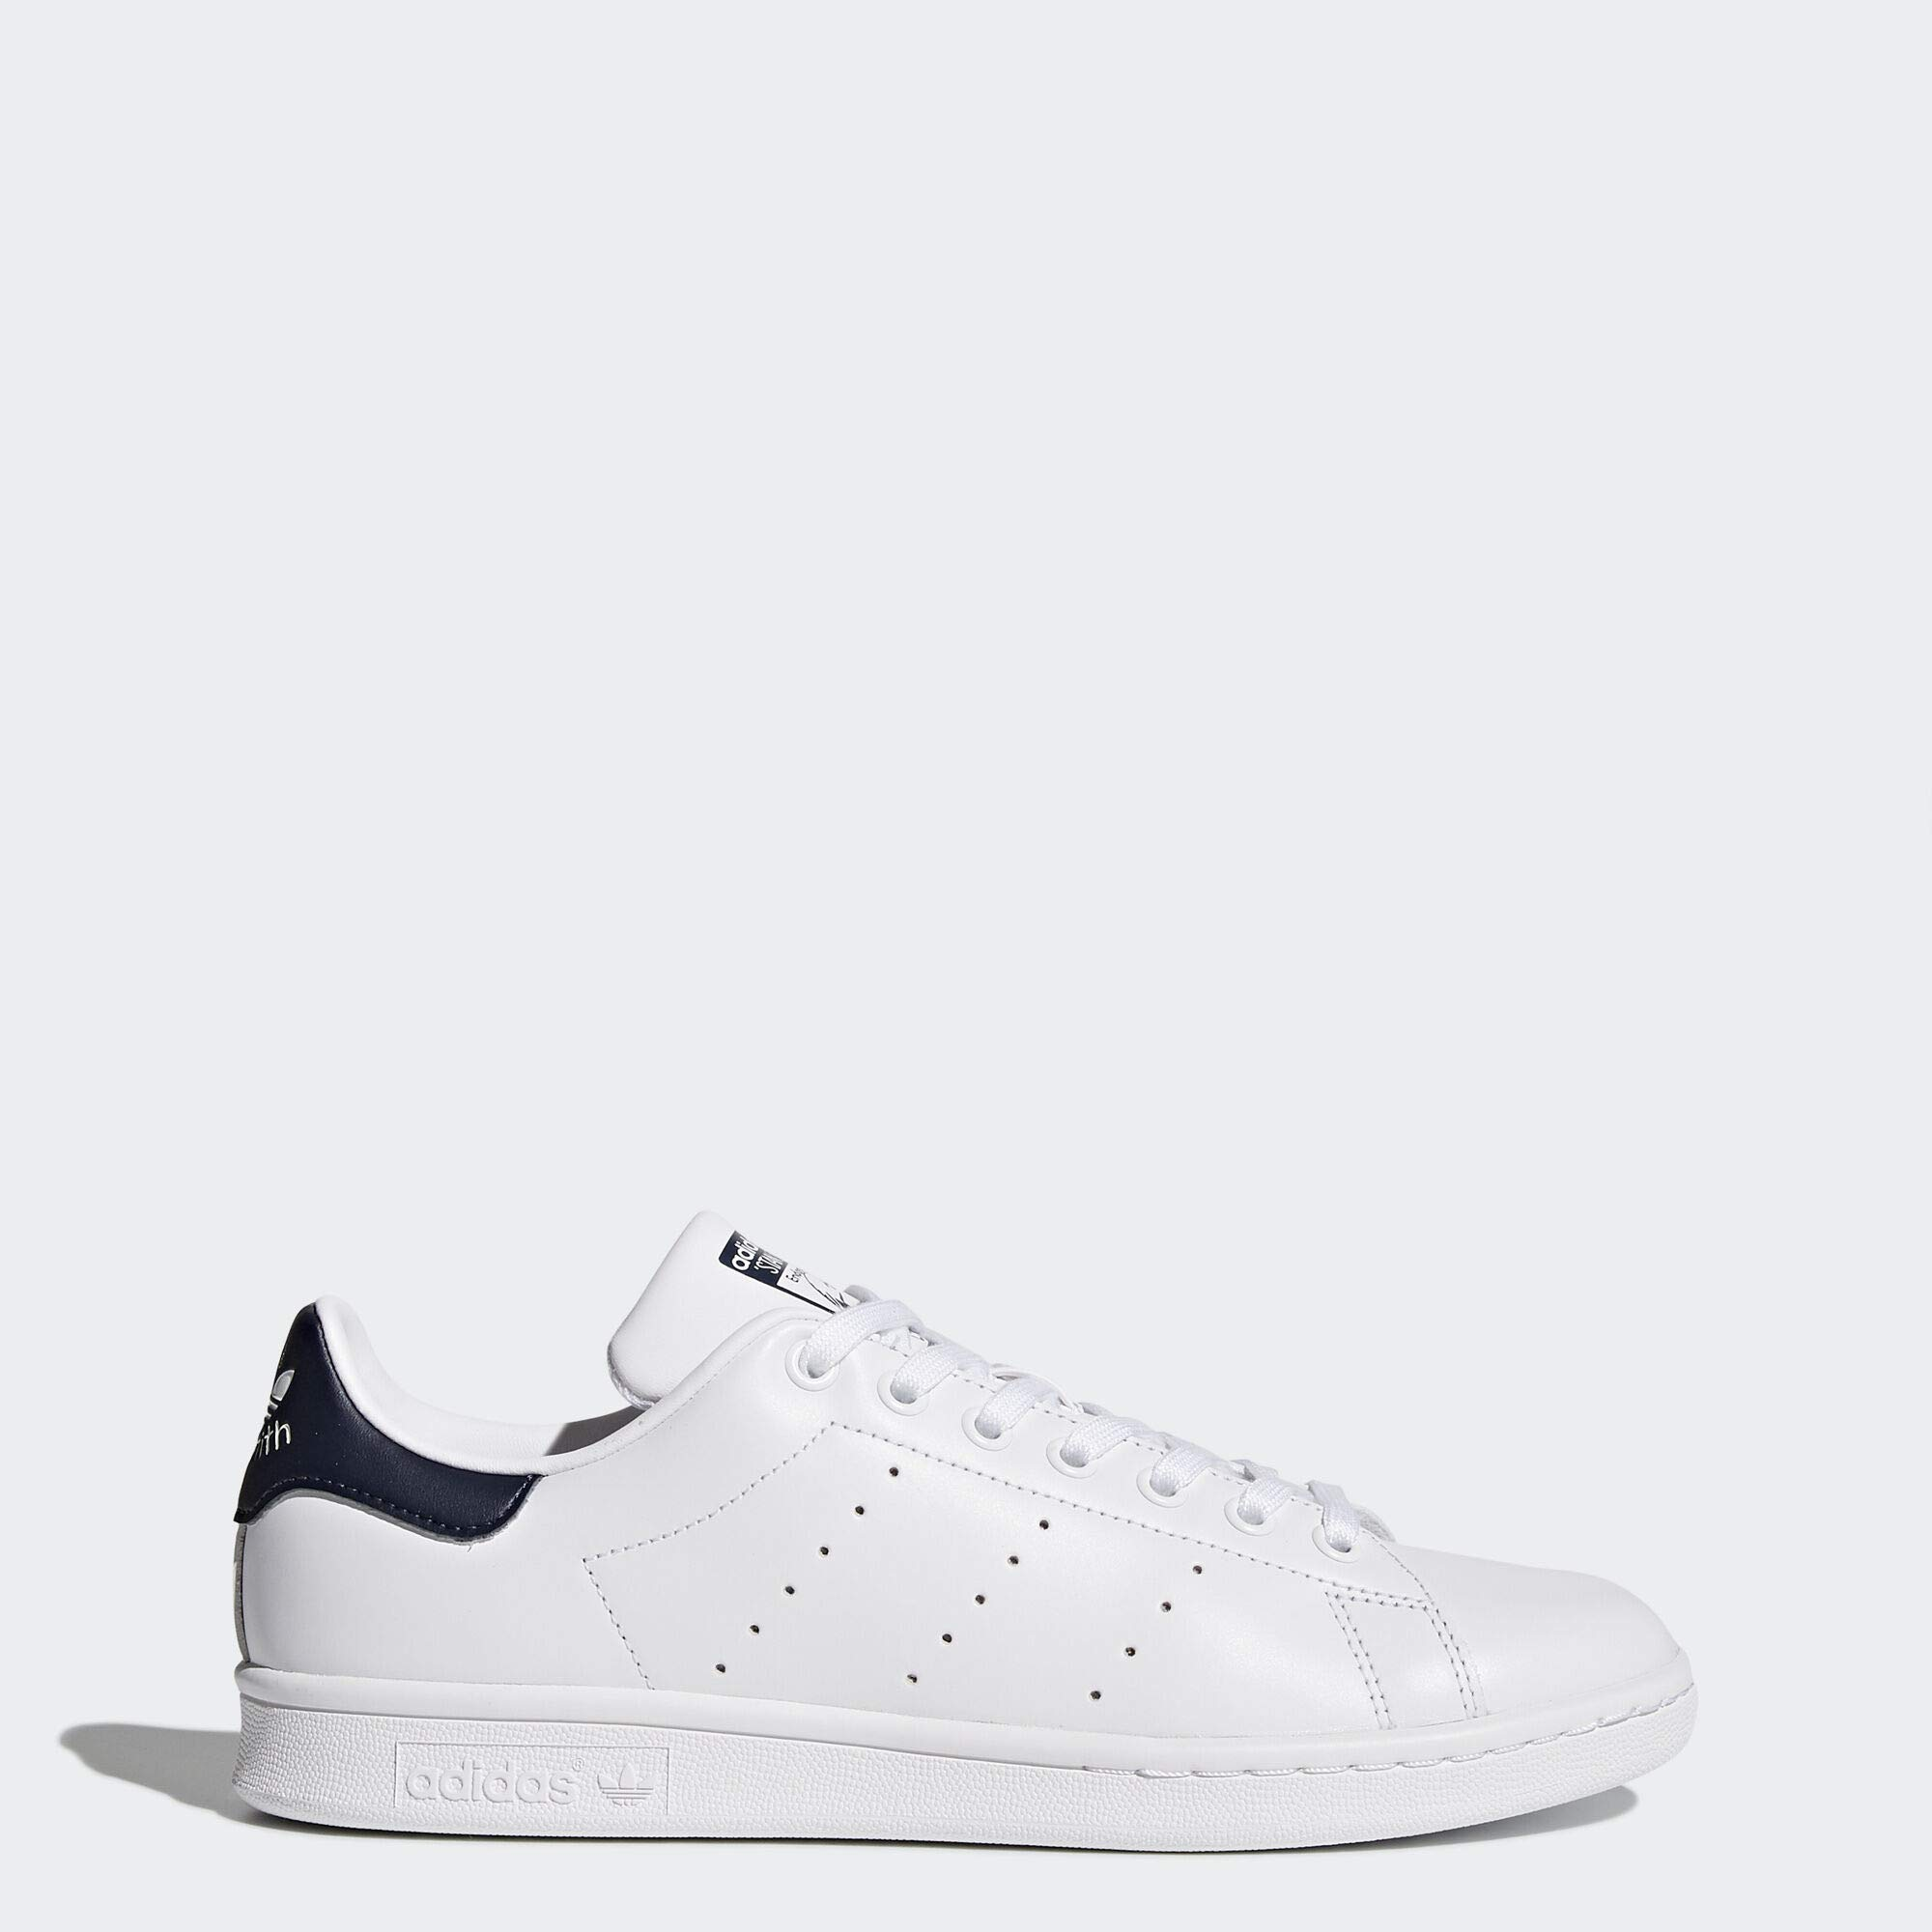 adidas Originals Men's Stan Smith Leather Sneaker, Core White/Dark Blue, 12 by adidas Originals